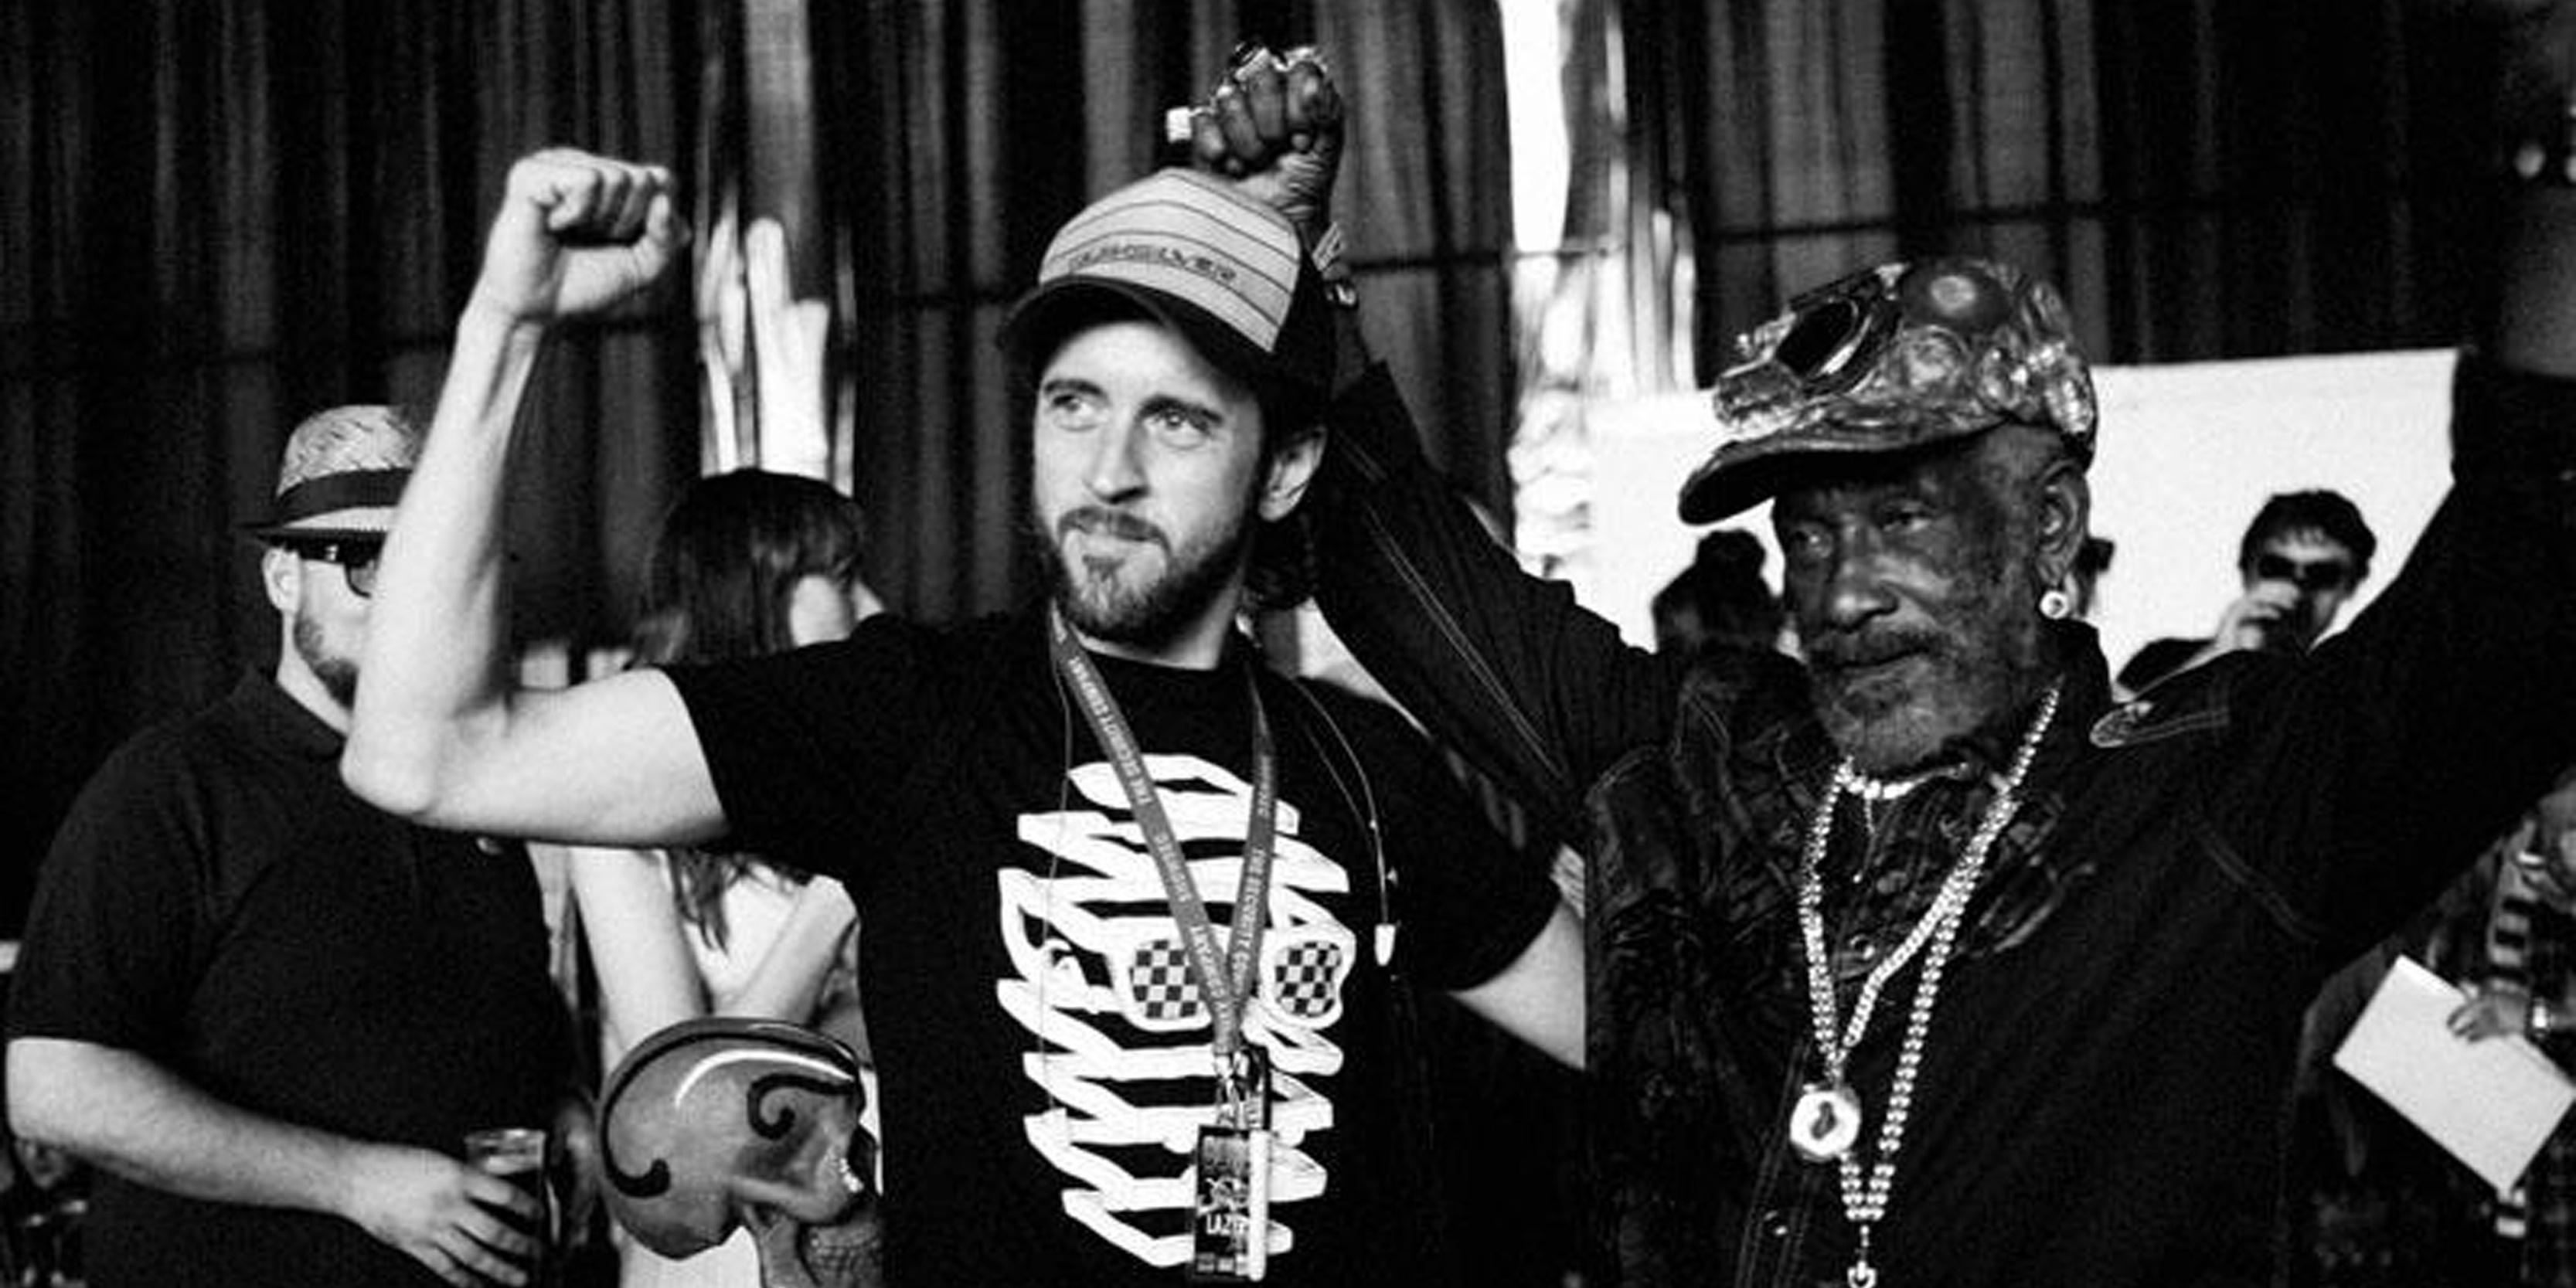 UK dub and reggae don Jstar makes his Singapore debut at kult kafé